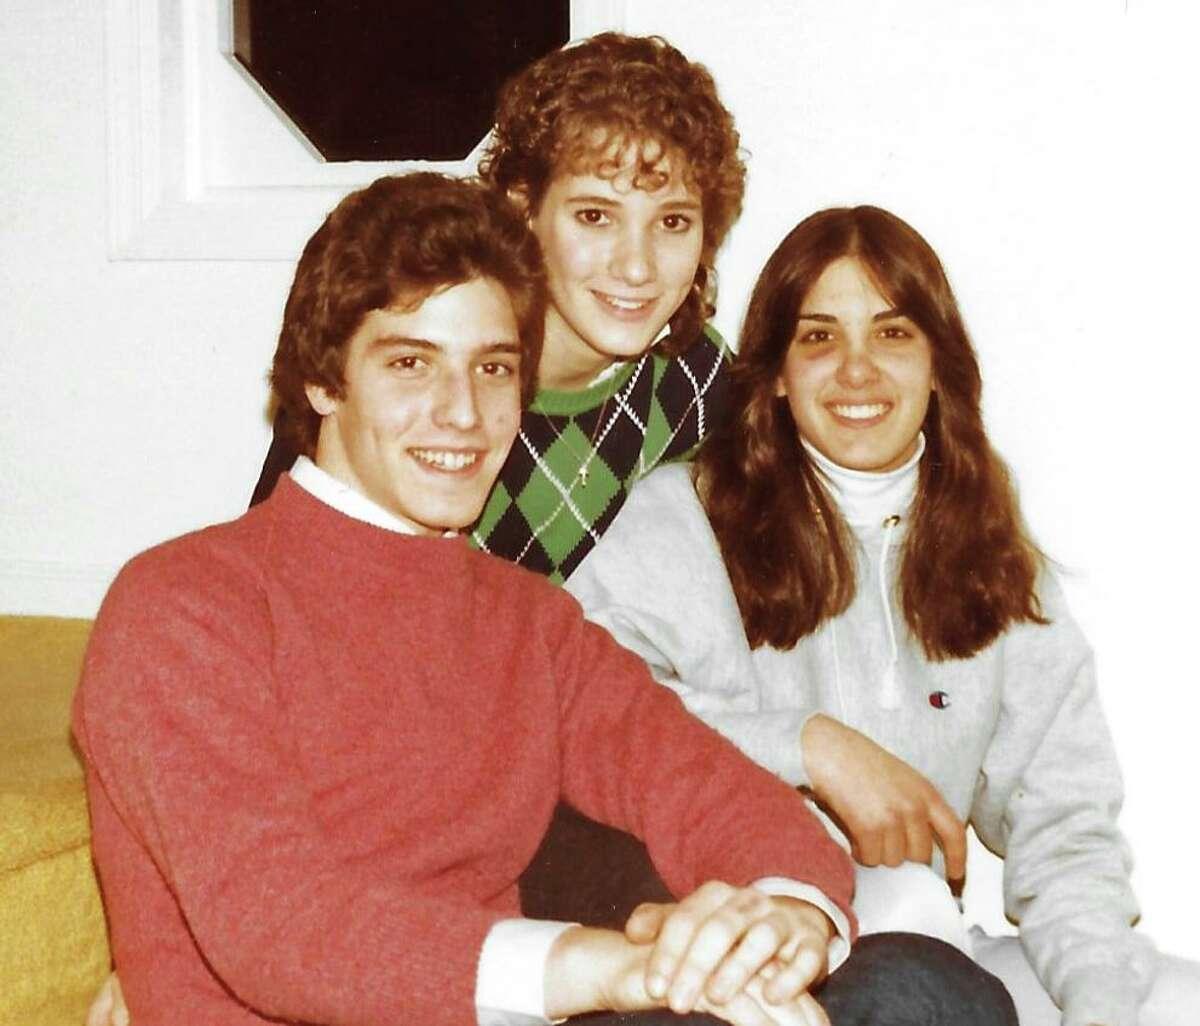 Stamford Advocate columnist Kevin McKeever, from left, Justine Metz andLesley Lane circa December 1985.